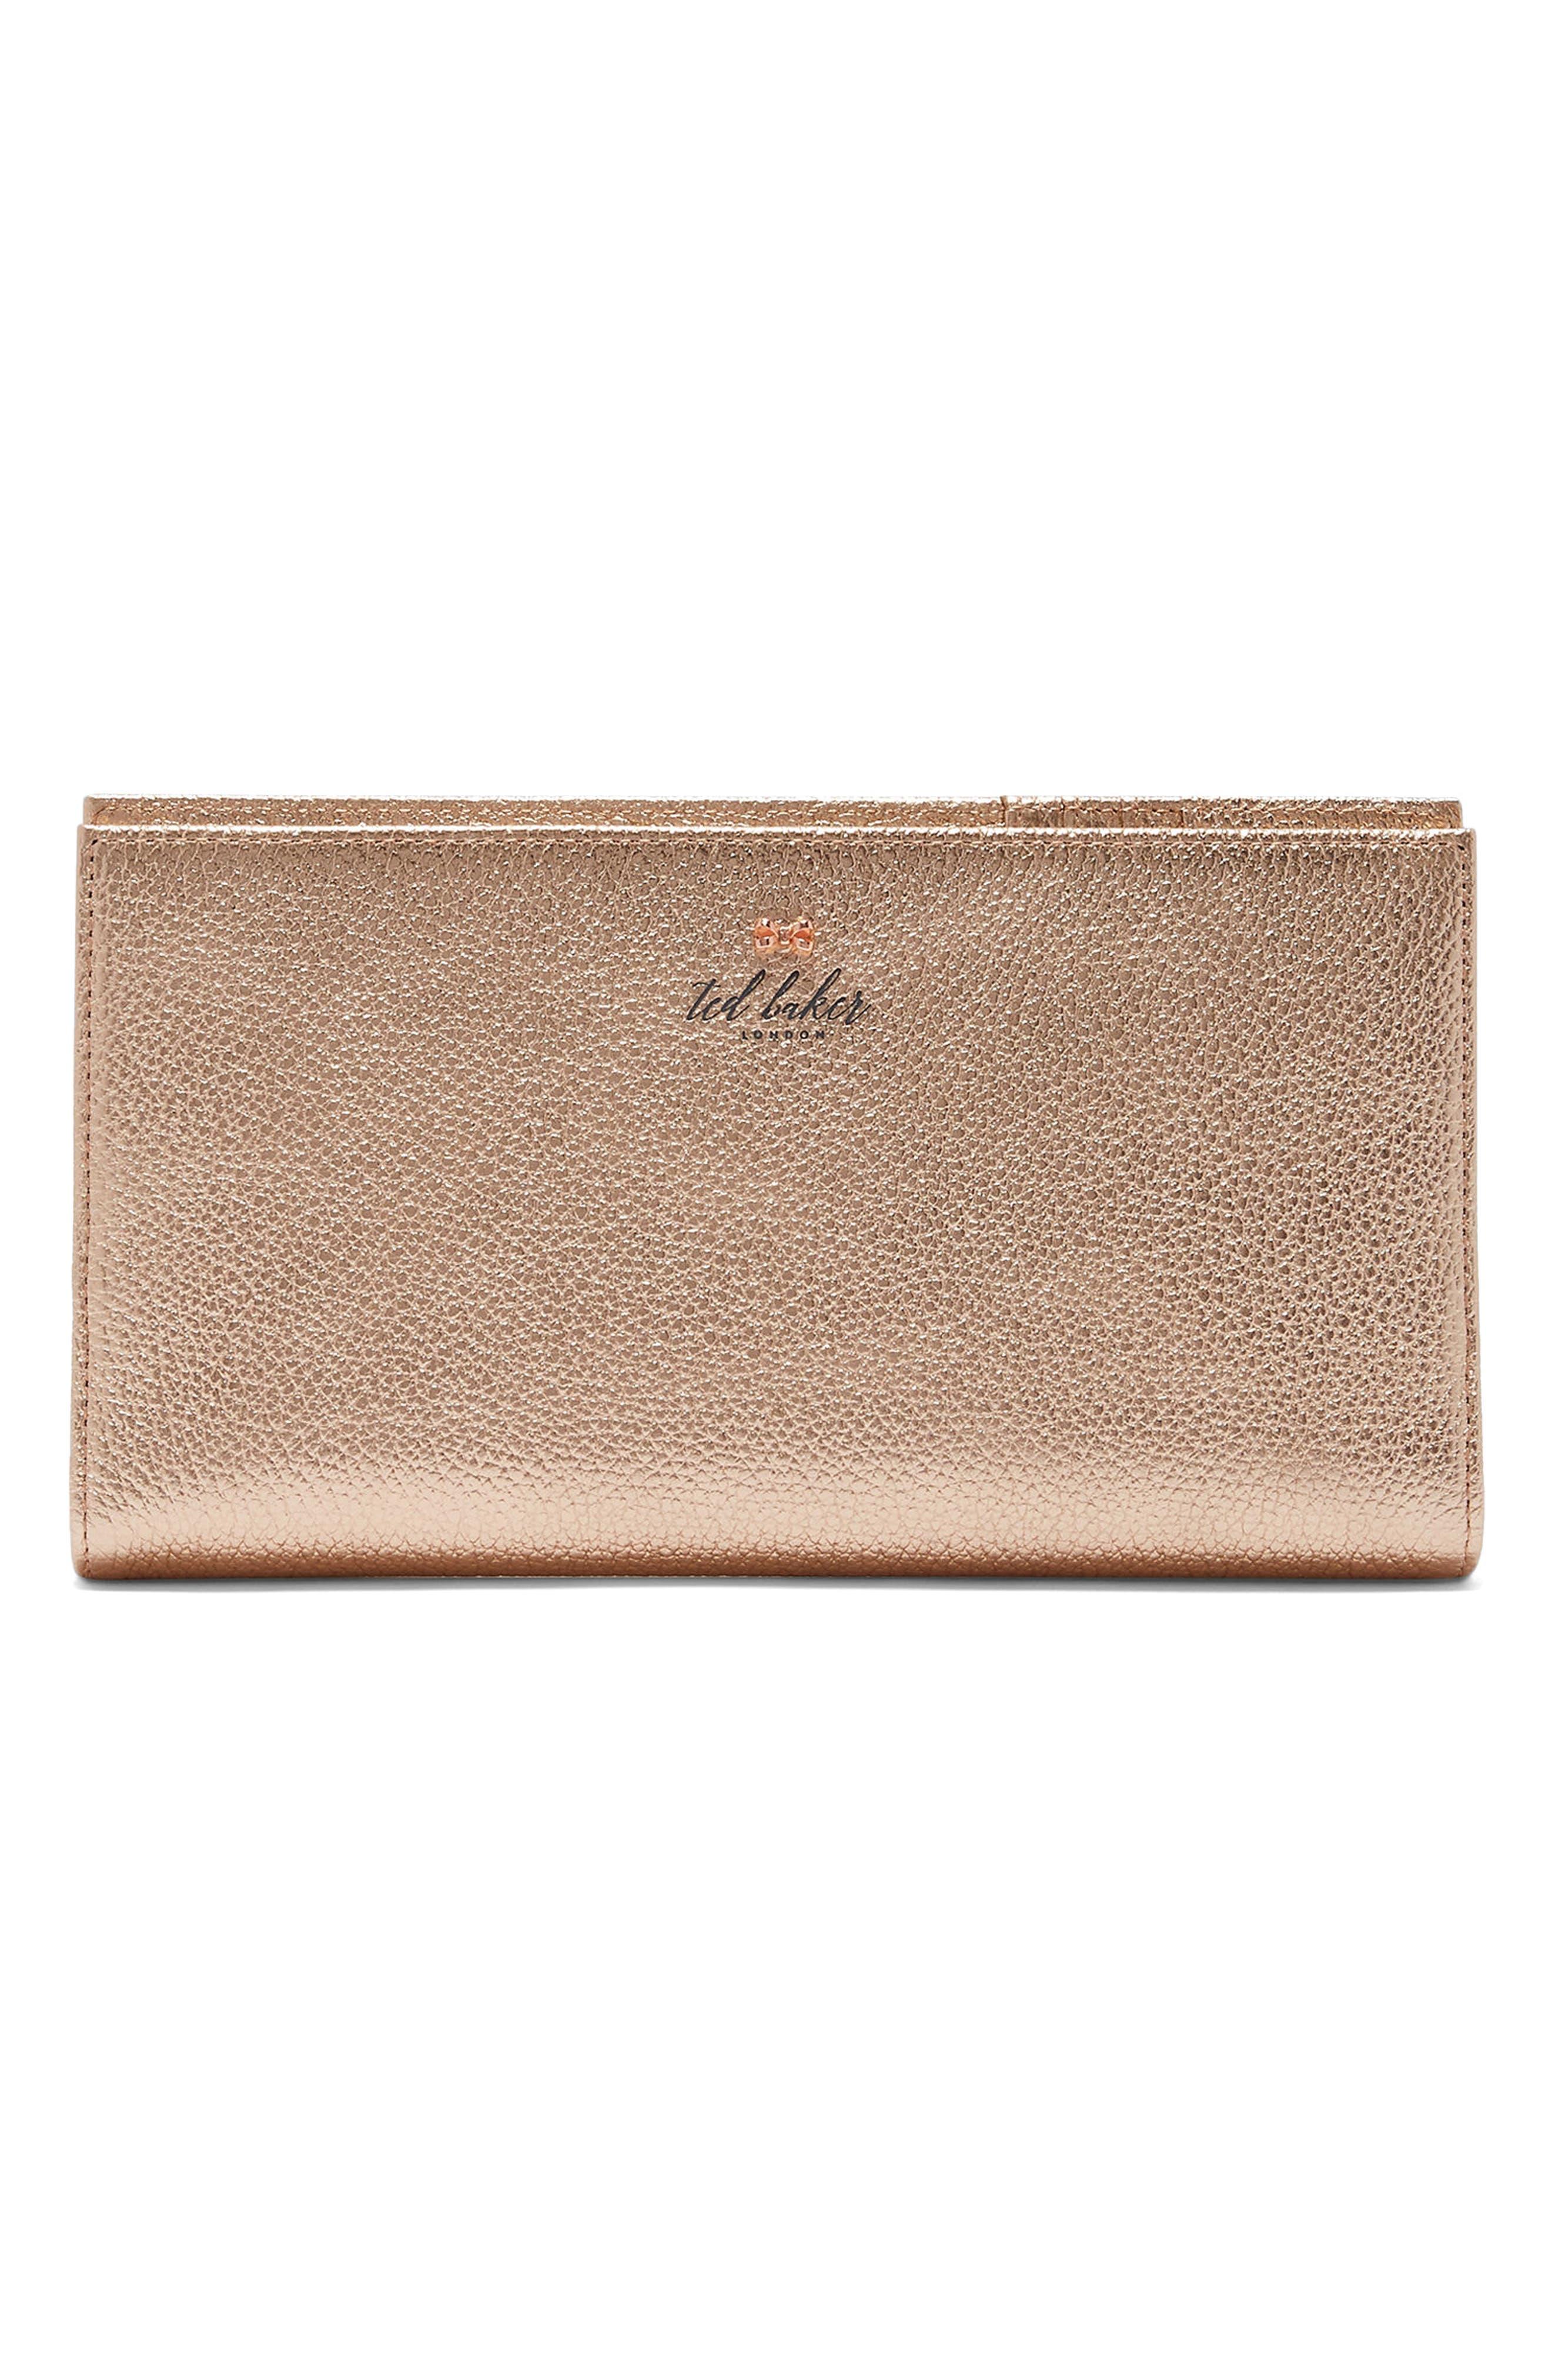 Kayy Metallic Leather Travel Wallet,                             Main thumbnail 3, color,